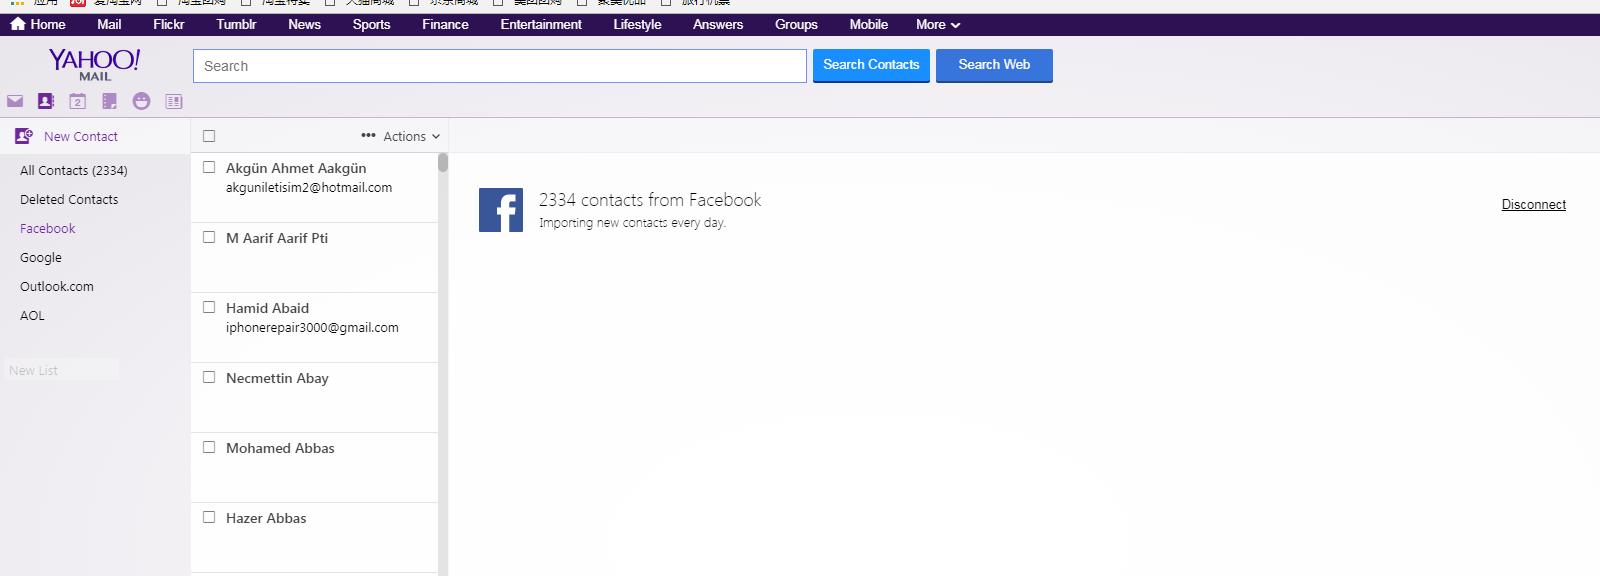 GkfXfGBx npj6 - 批量获取Facebook联系人的邮箱